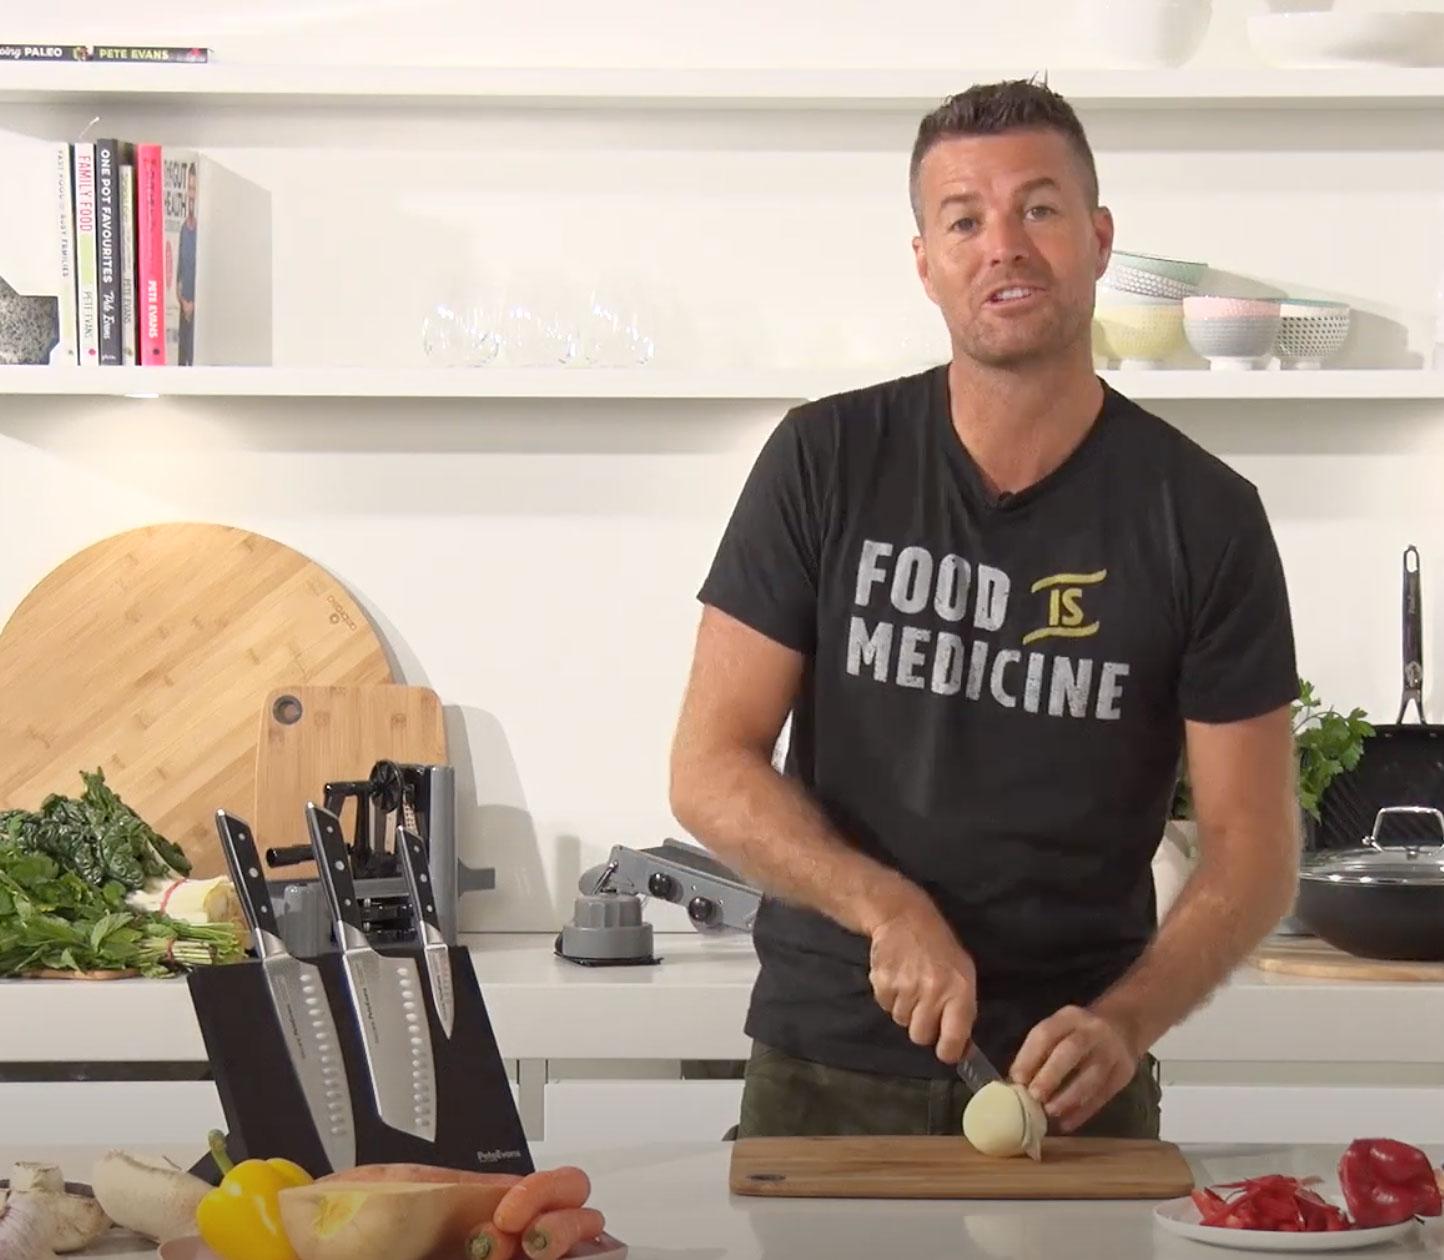 Pete Evans: Chef, Health Coach & Paleo Ambassadors